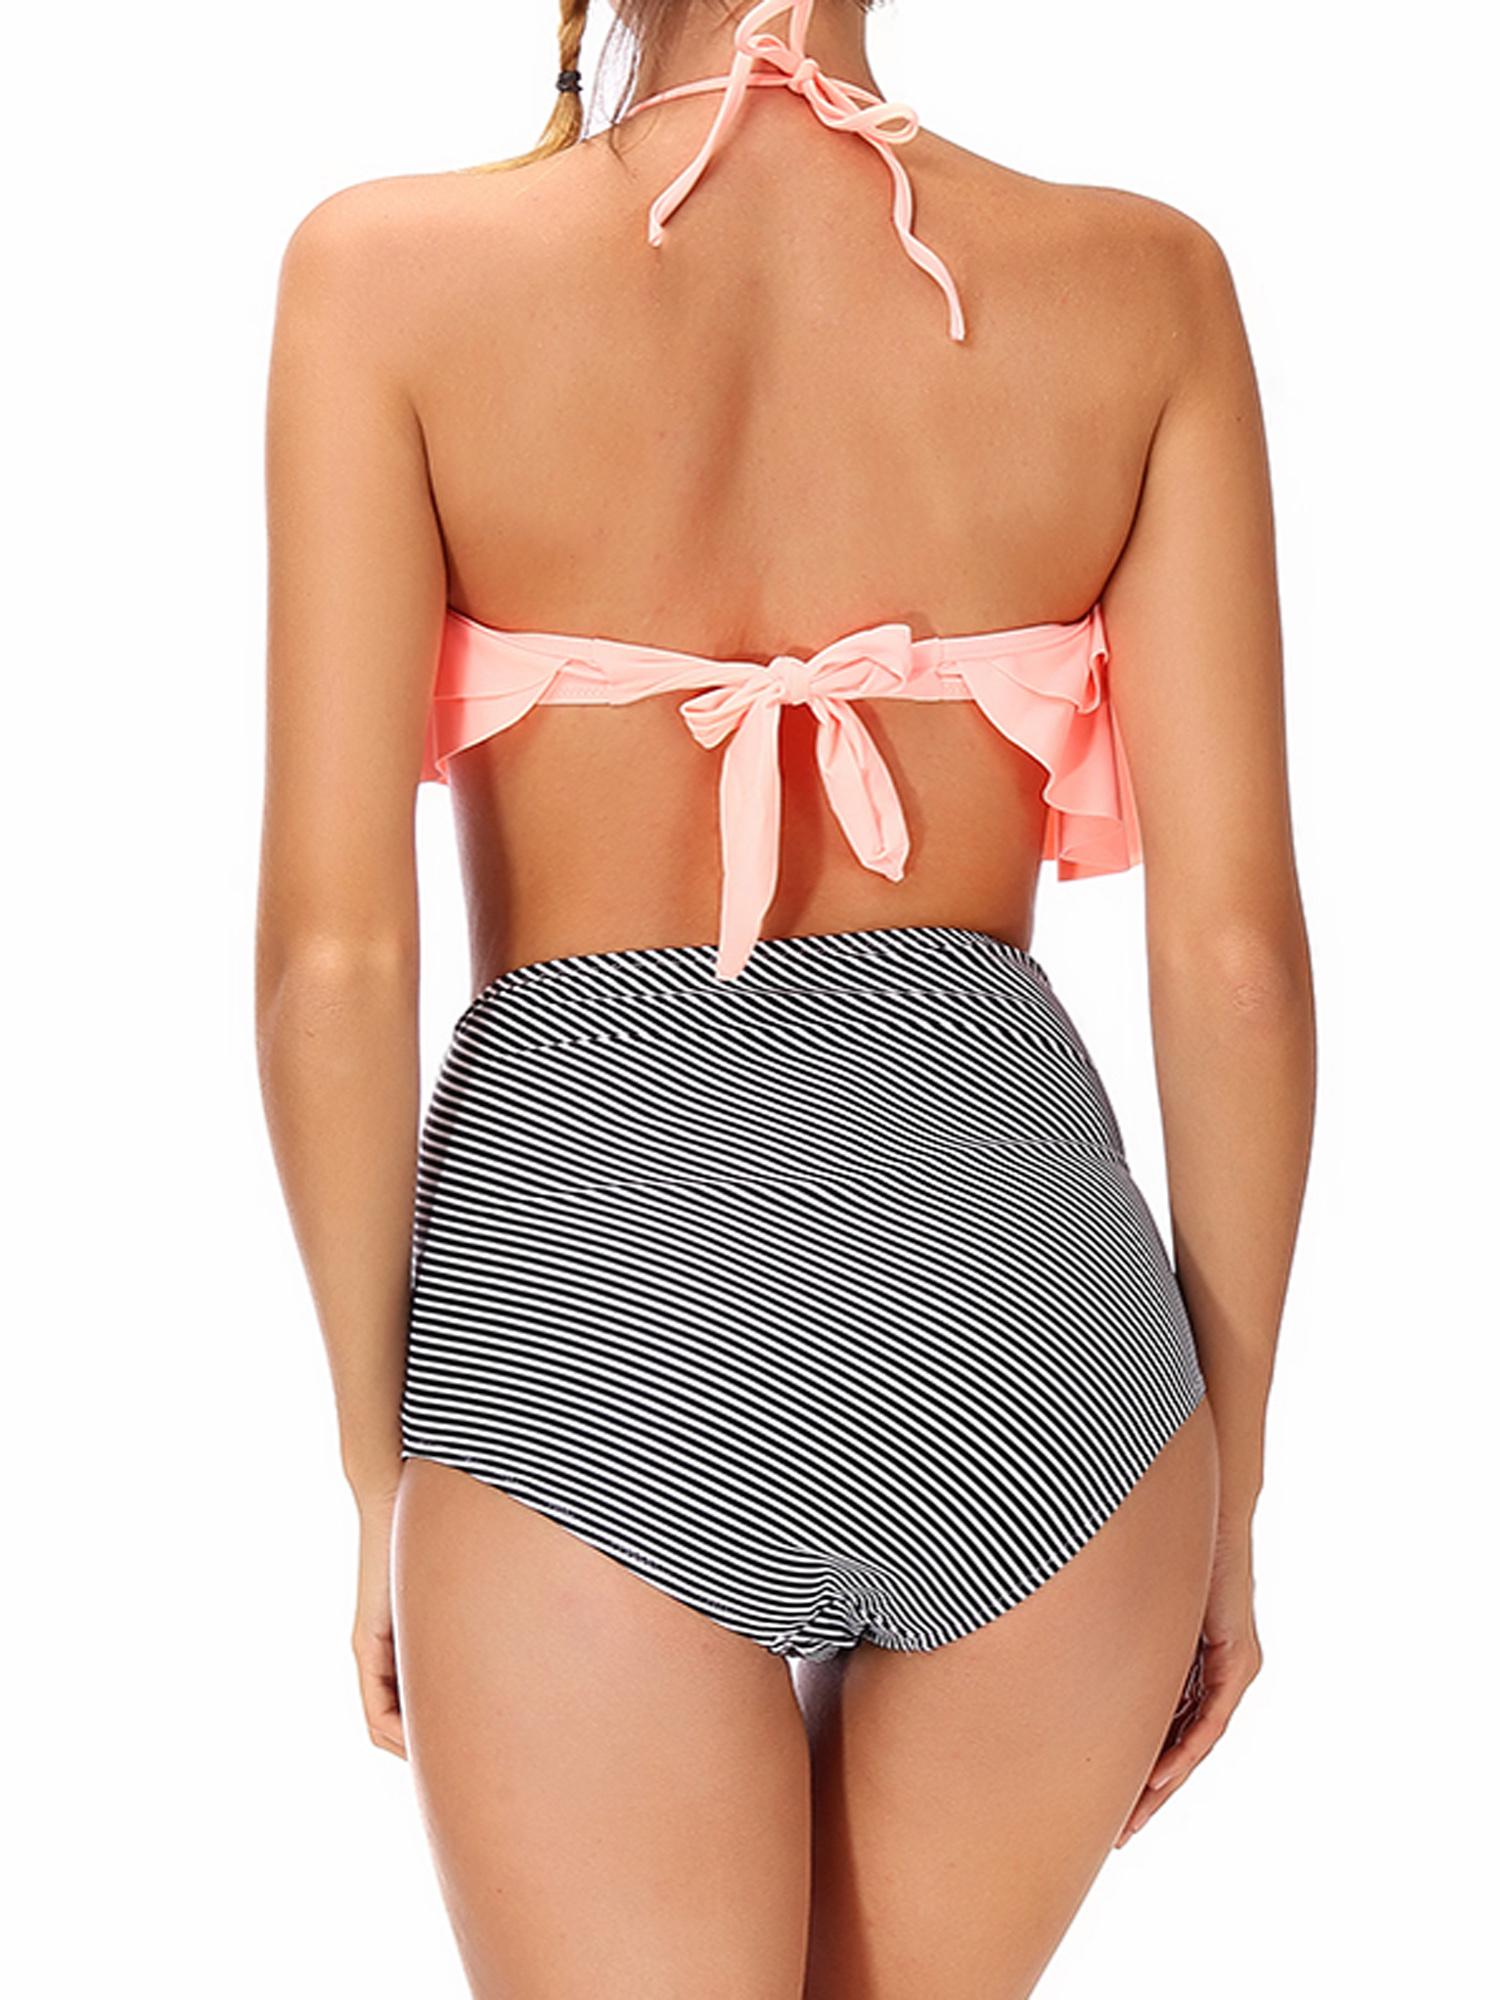 1a31ba5801 Lelinta - LELINTA Juniors  Bandage Hight Waist Halter Bikini Set Ruffle  Tops Swimsuit Bathing Suit Swimwear Beach Dress - Walmart.com